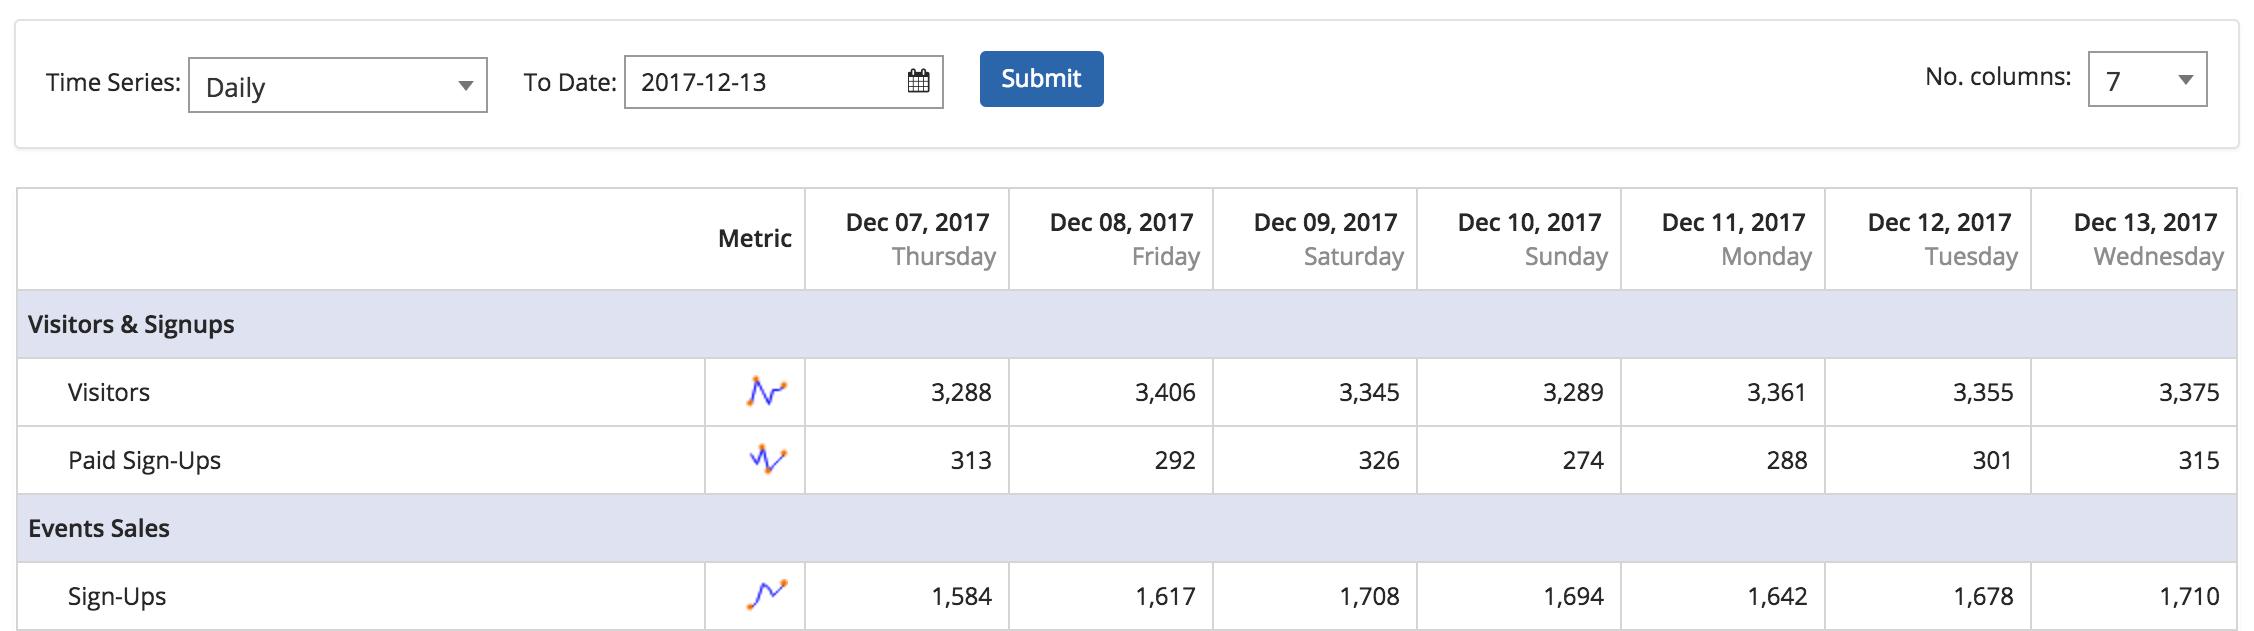 metrics-sheet